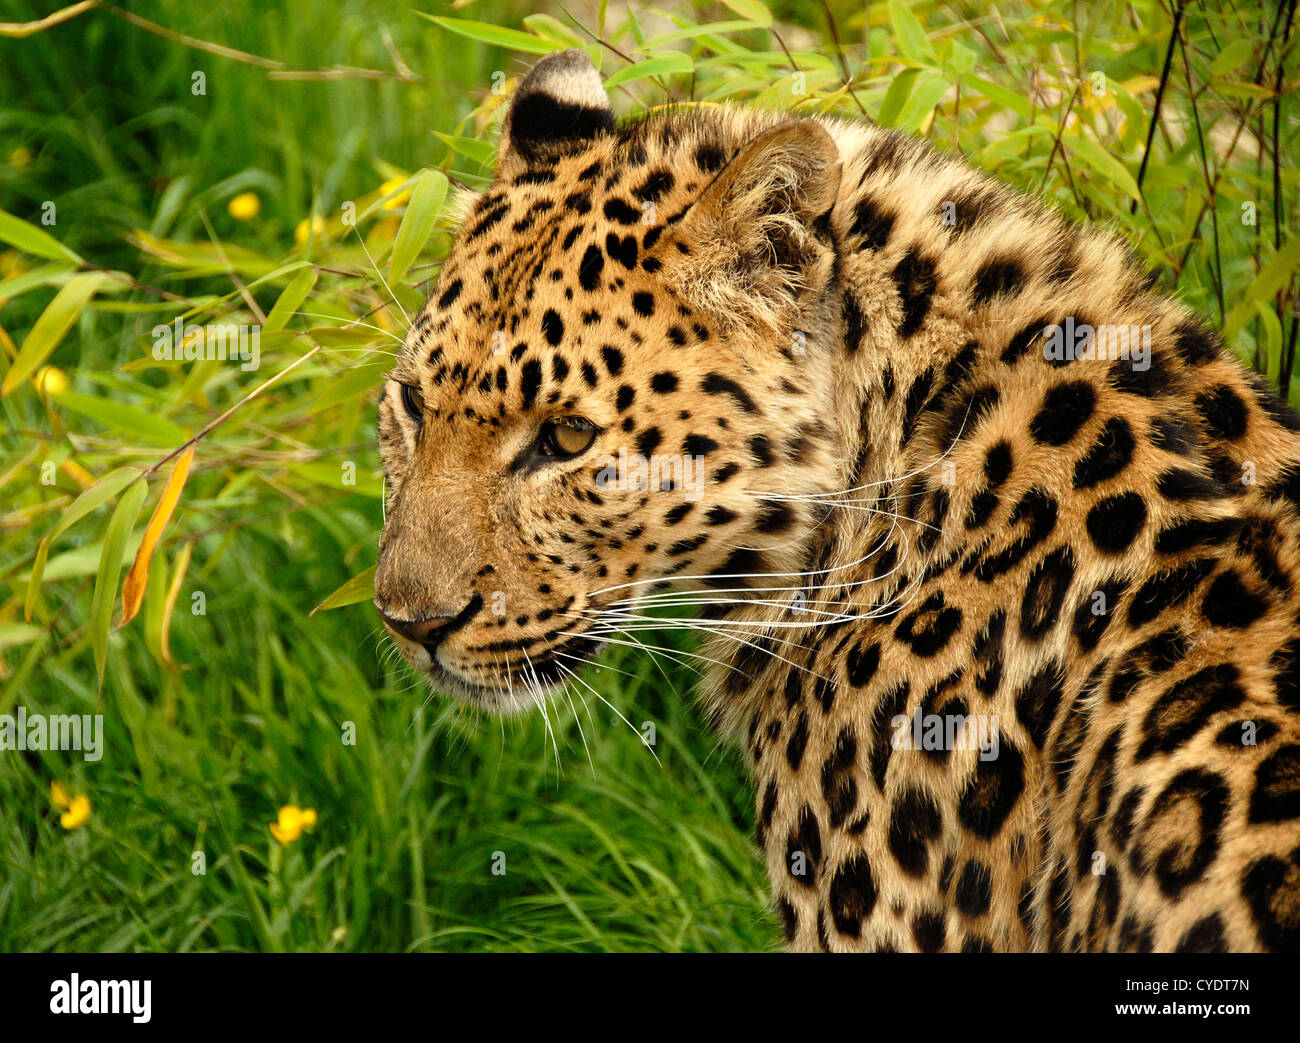 Amur Leopard close up looking toward left - Stock Image